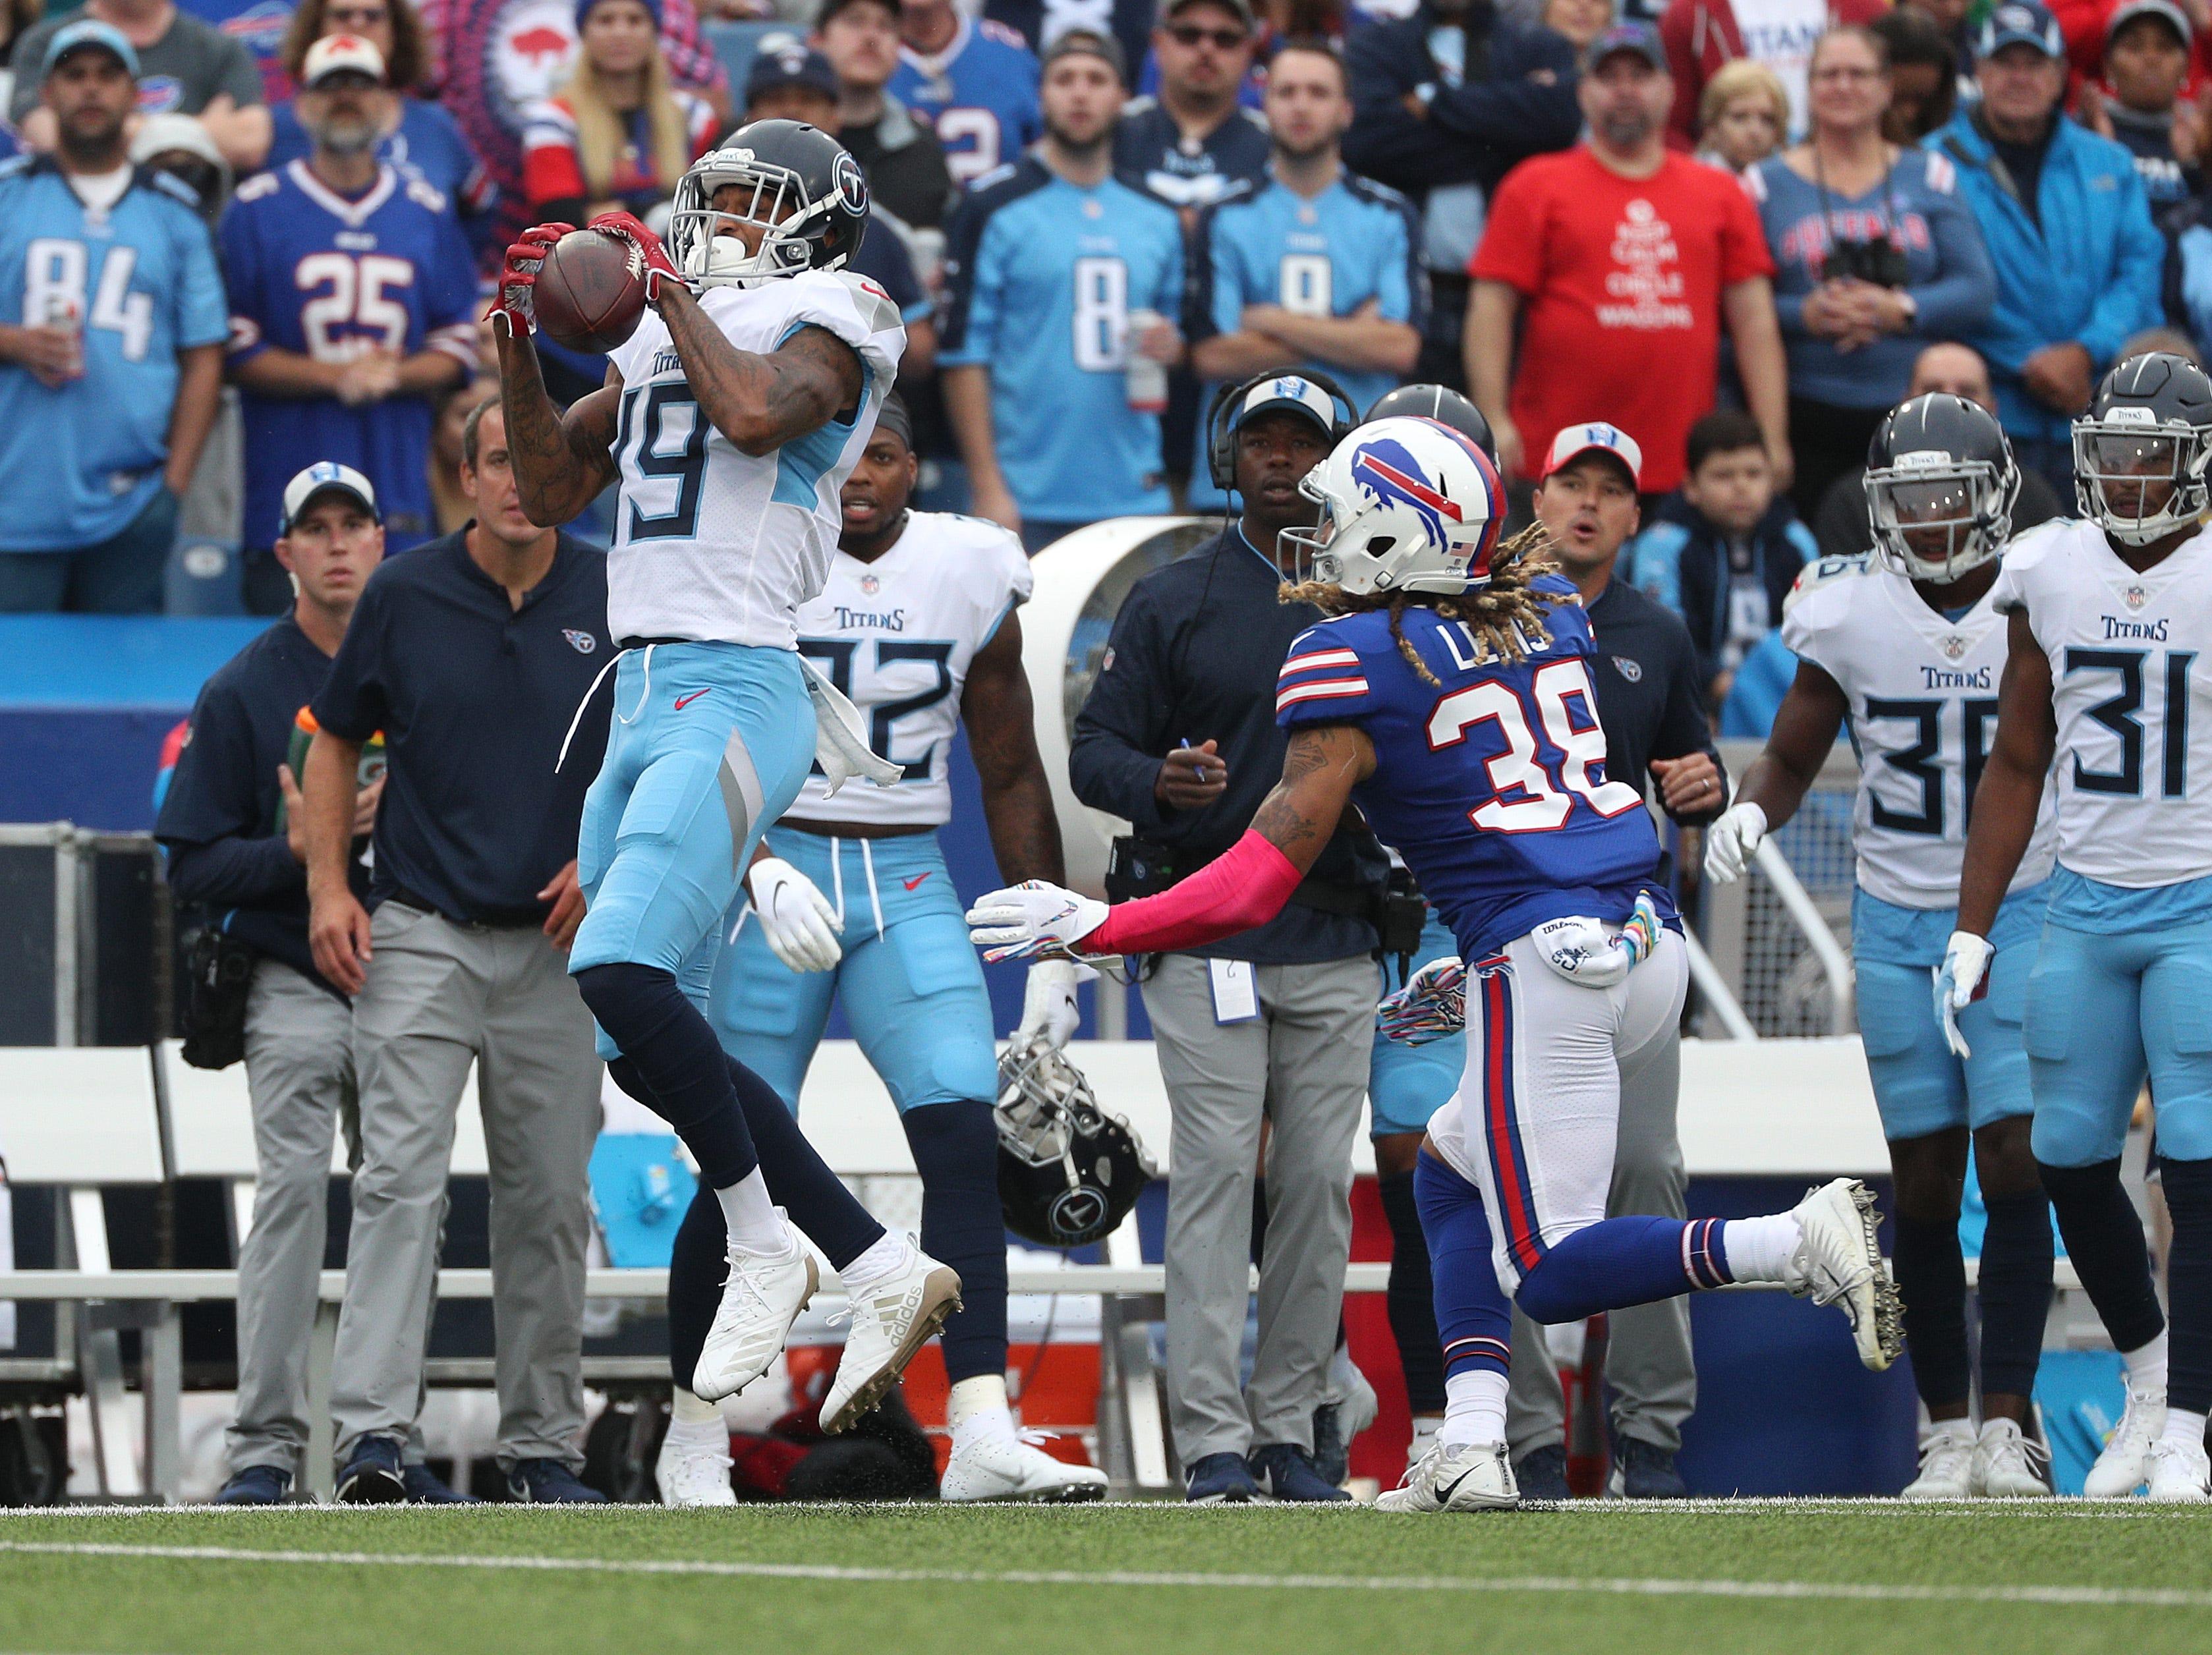 Titan's receiver Tajae Sharpe catches a pass in front pf Bills Ryan Lewis.